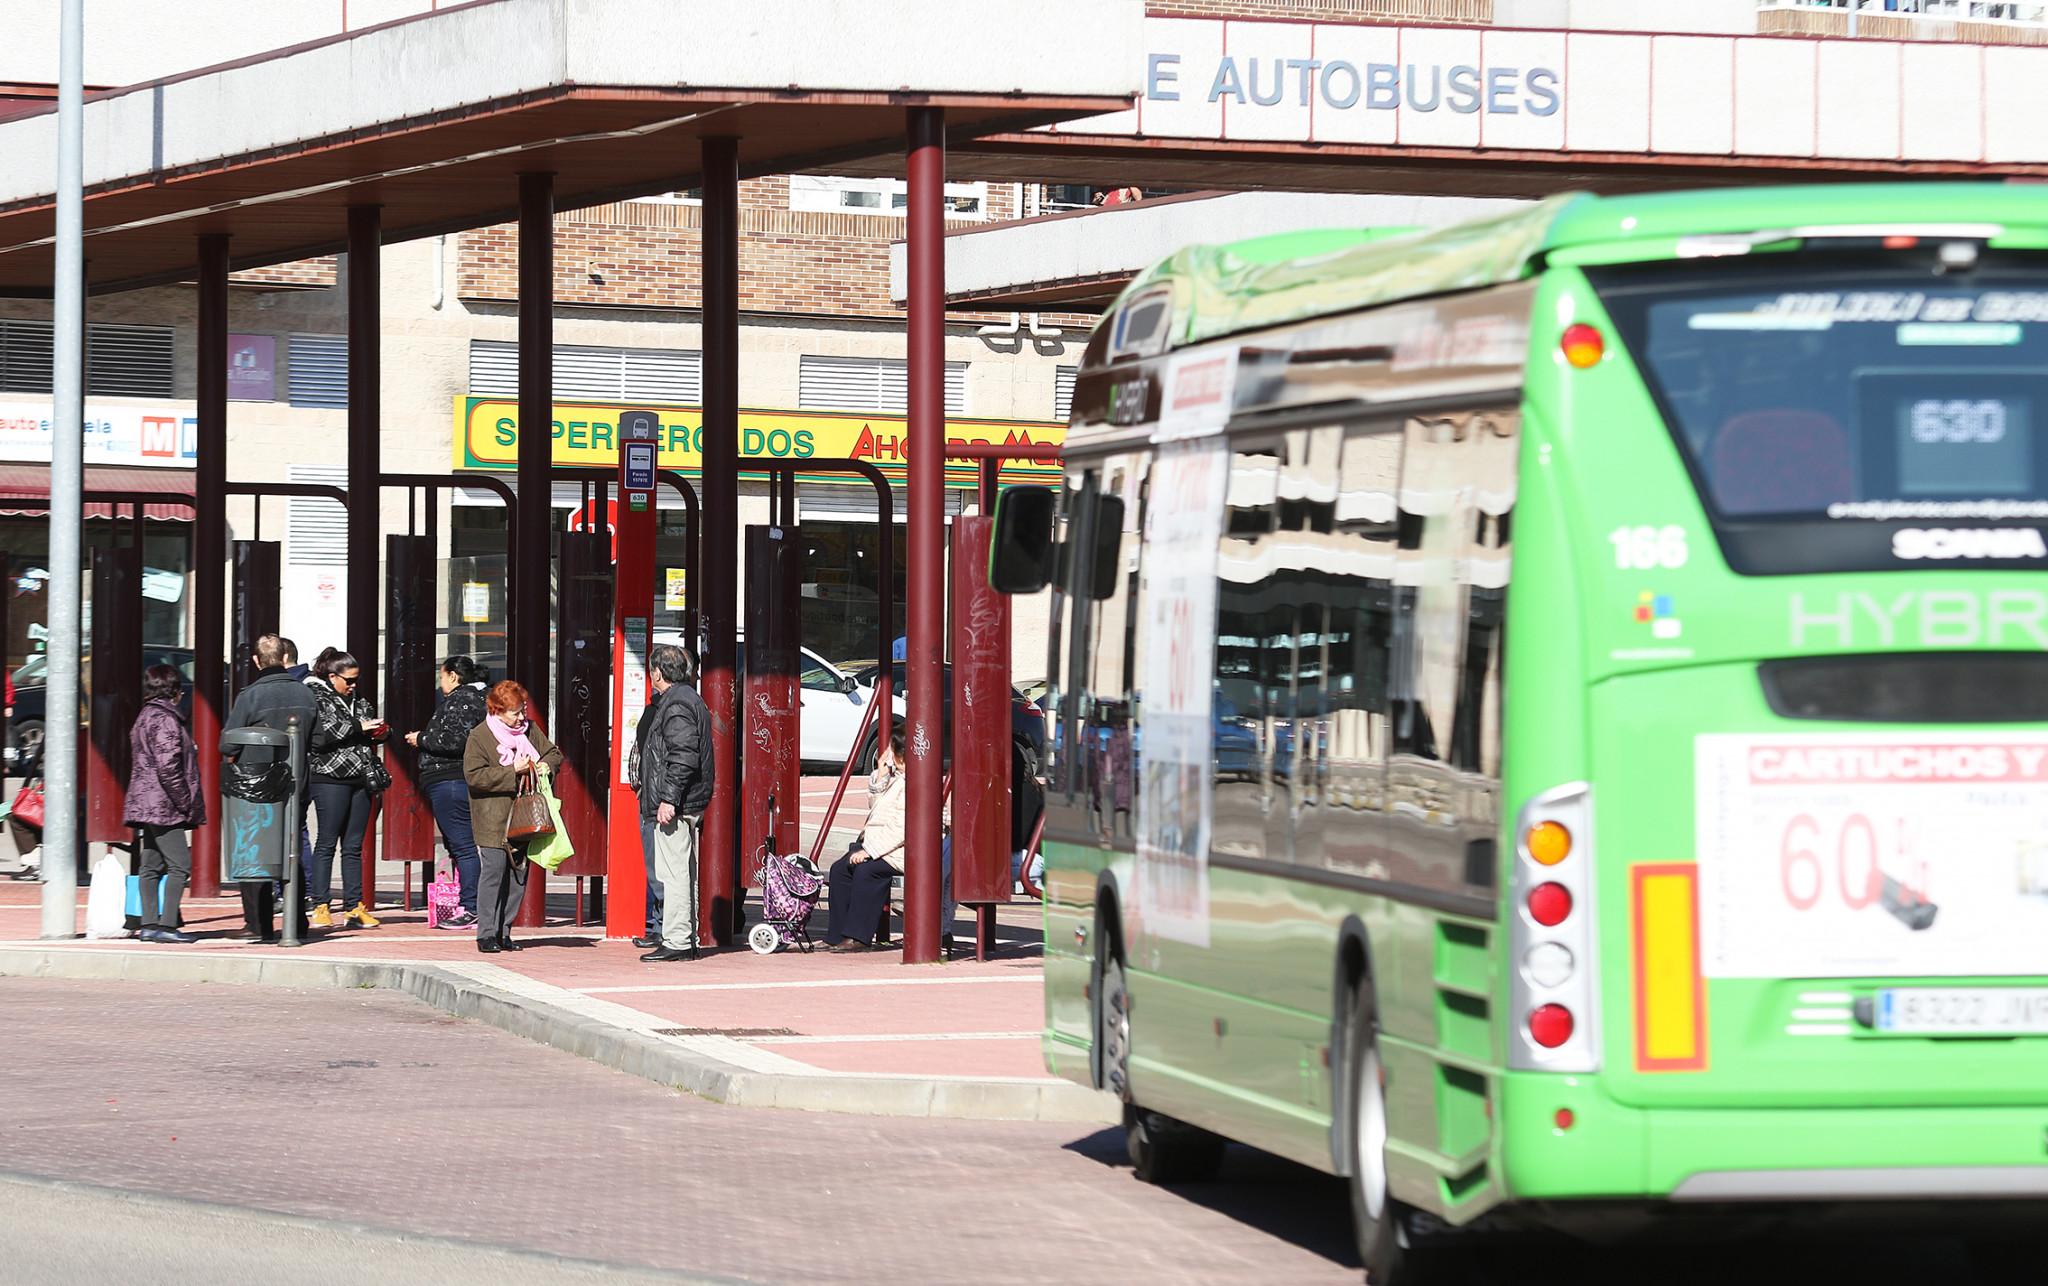 estacion autobuses 3